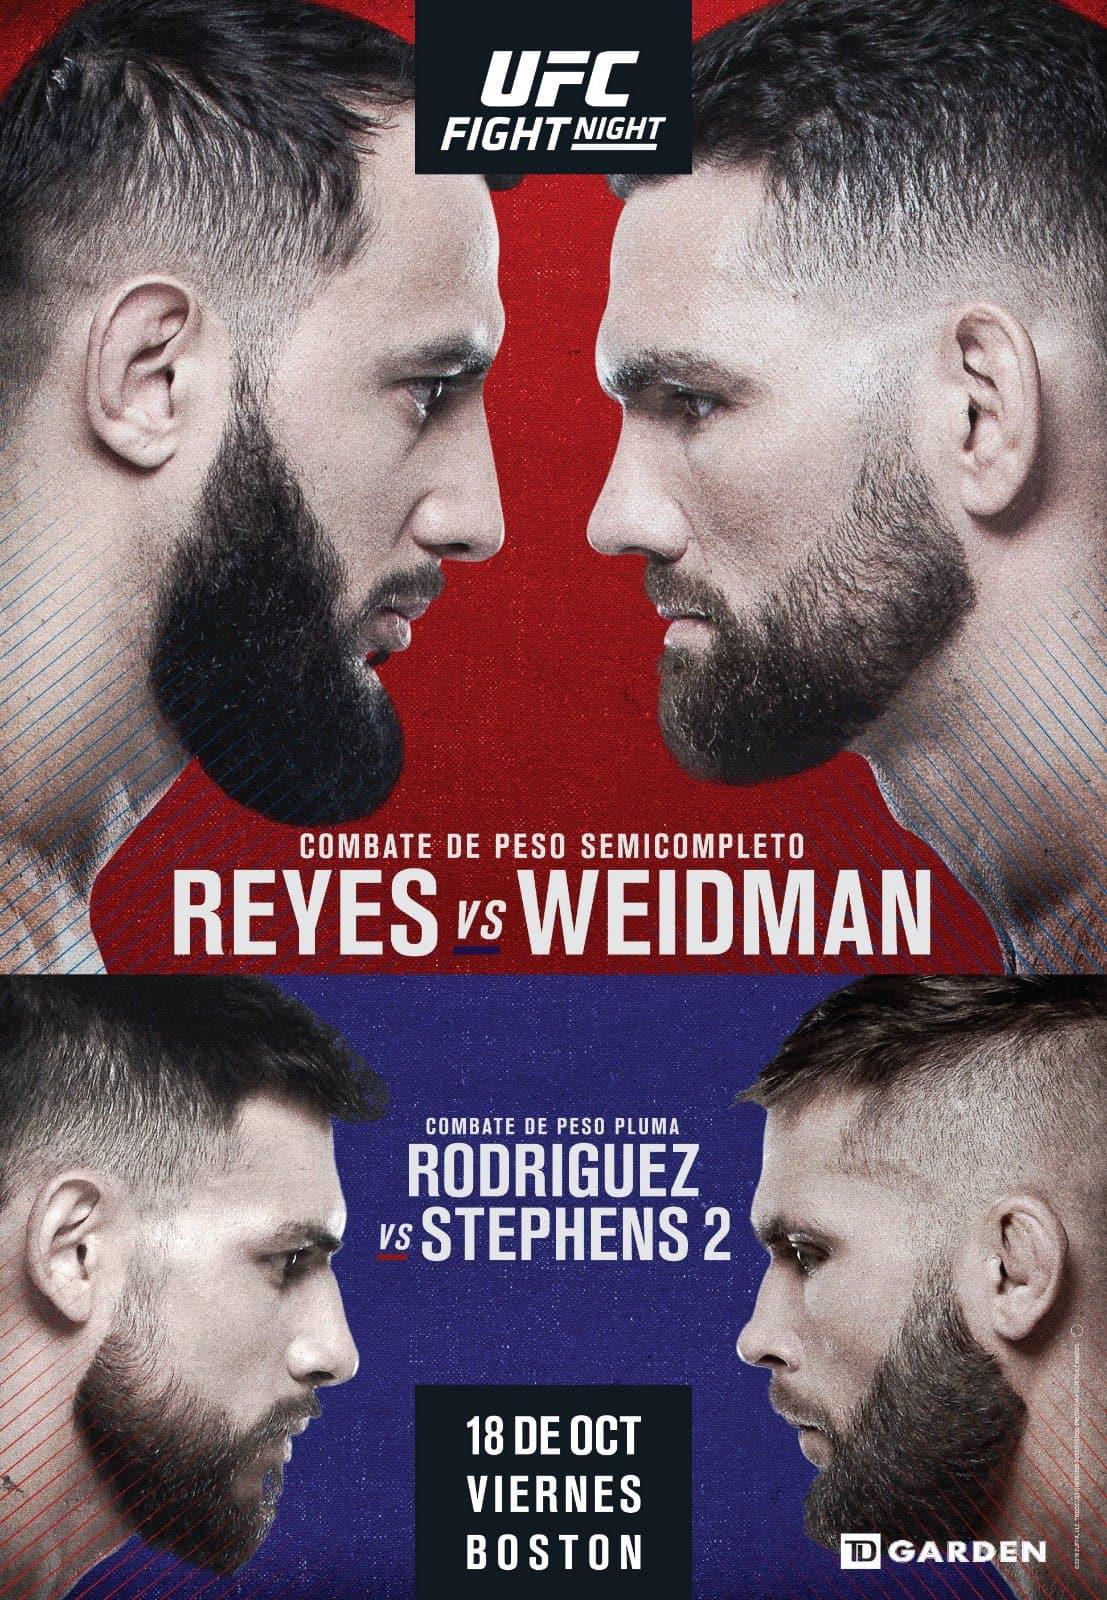 UFC on ESPN: Reyes vs. Weidman 1